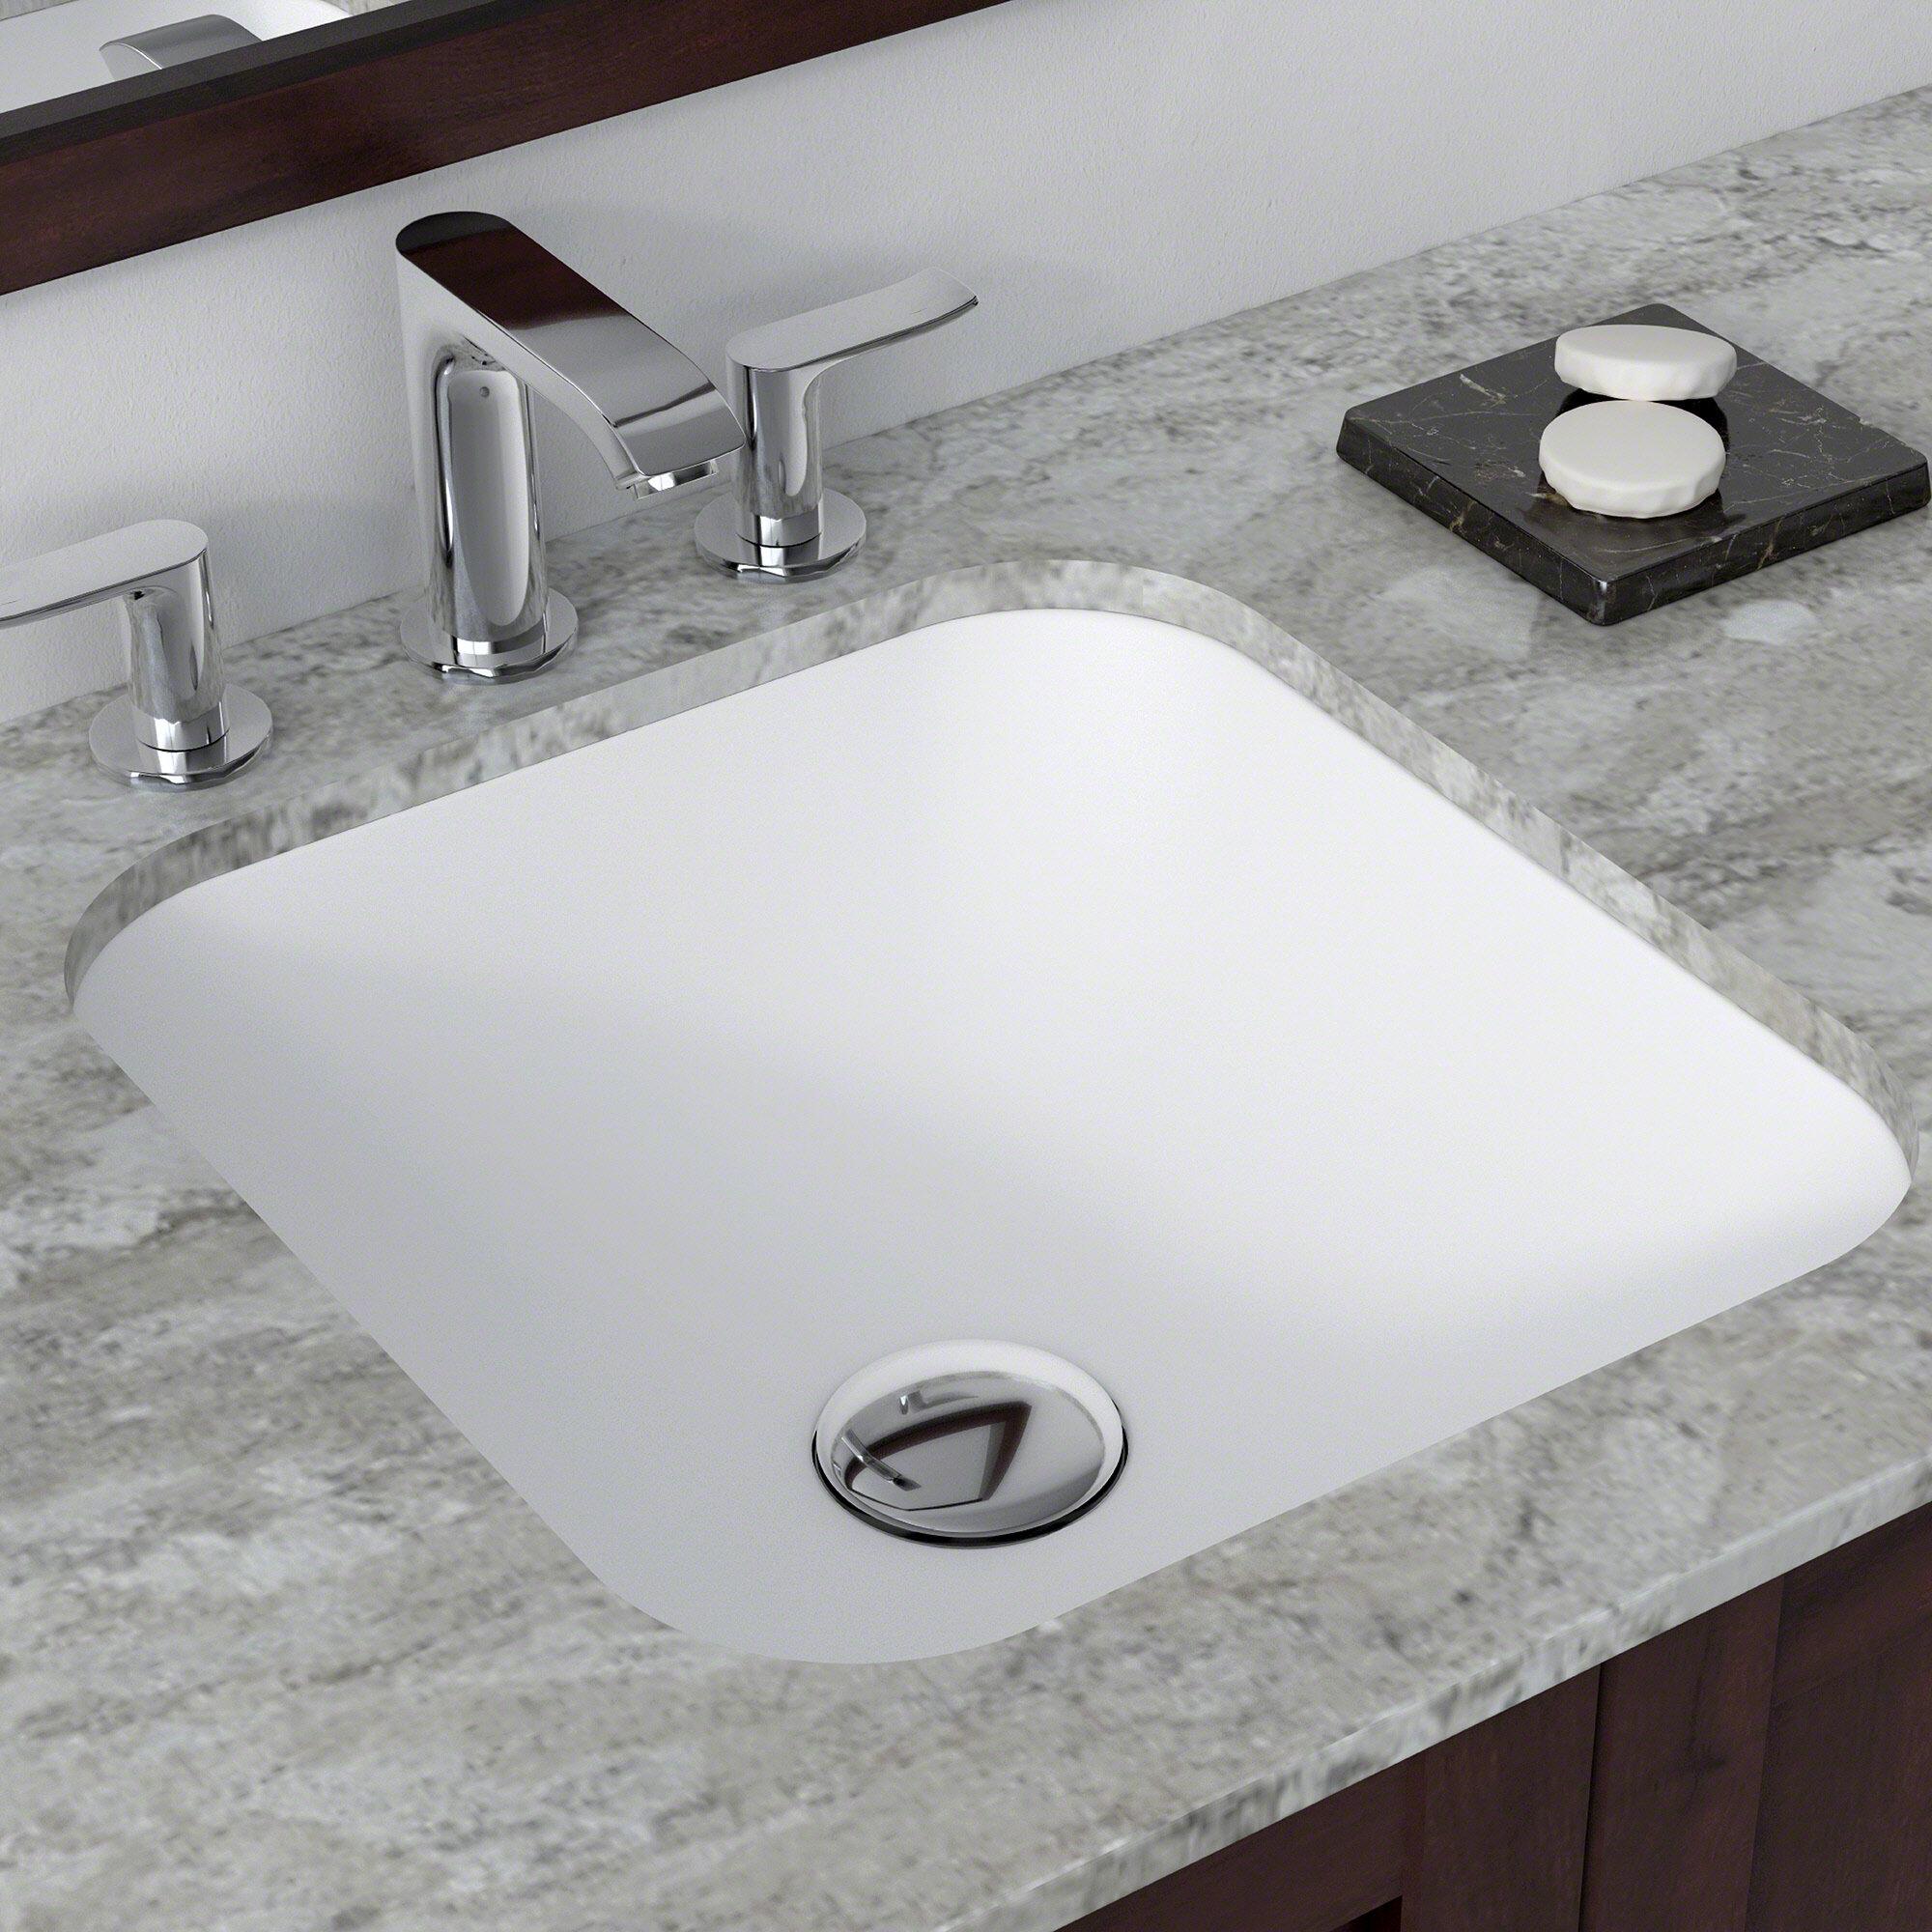 & Kraus Natura™ Square Undermount Bathroom Sink \u0026 Reviews | Wayfair